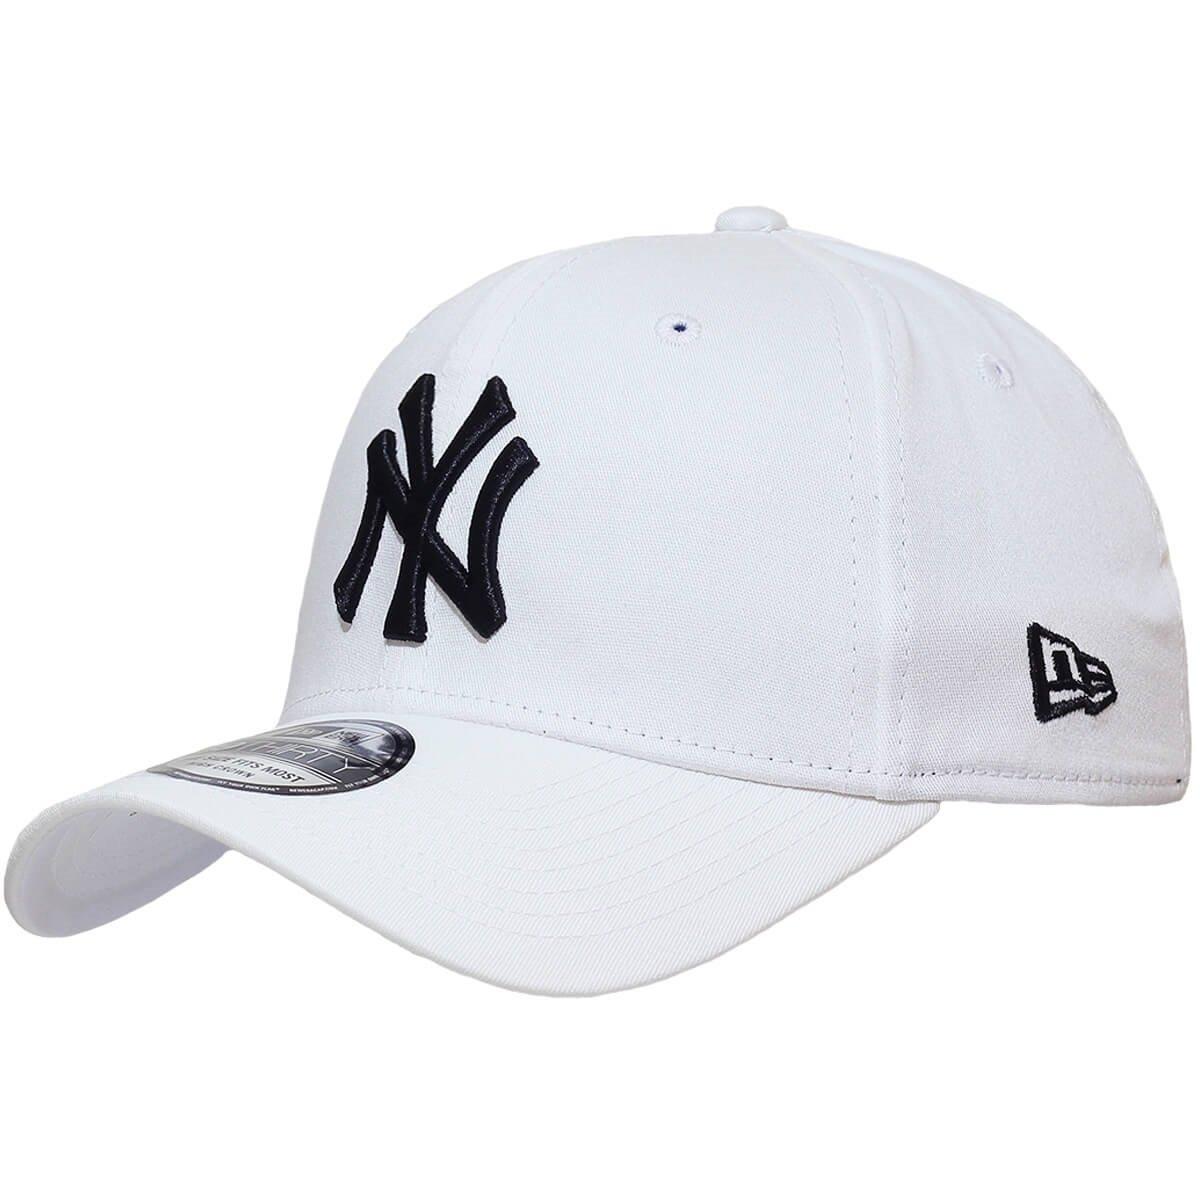 85ae77037 Boné New Era Aba Curva Fechado Mlb Ny Yankees Colo - Branco - Compre Agora